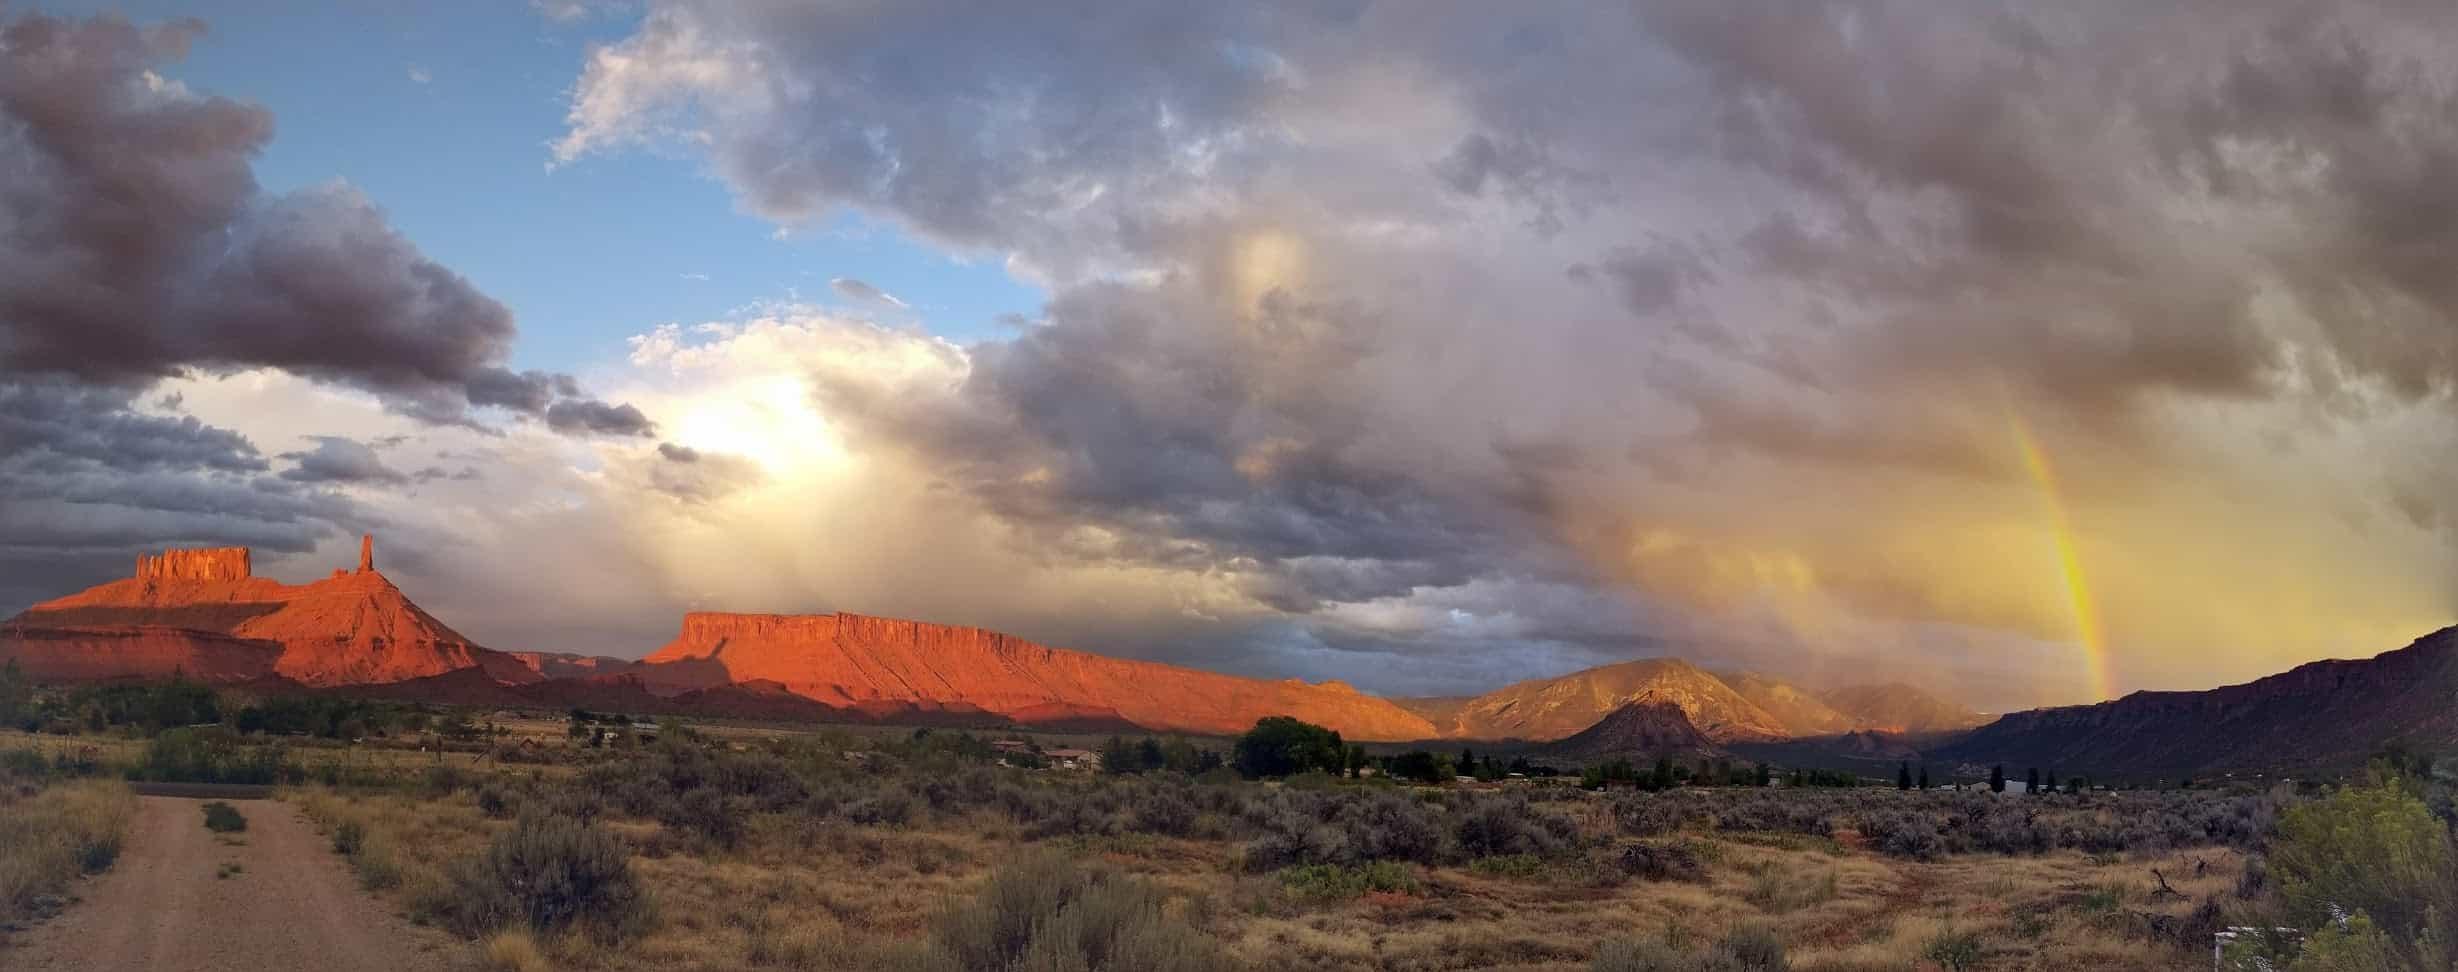 sunset storms